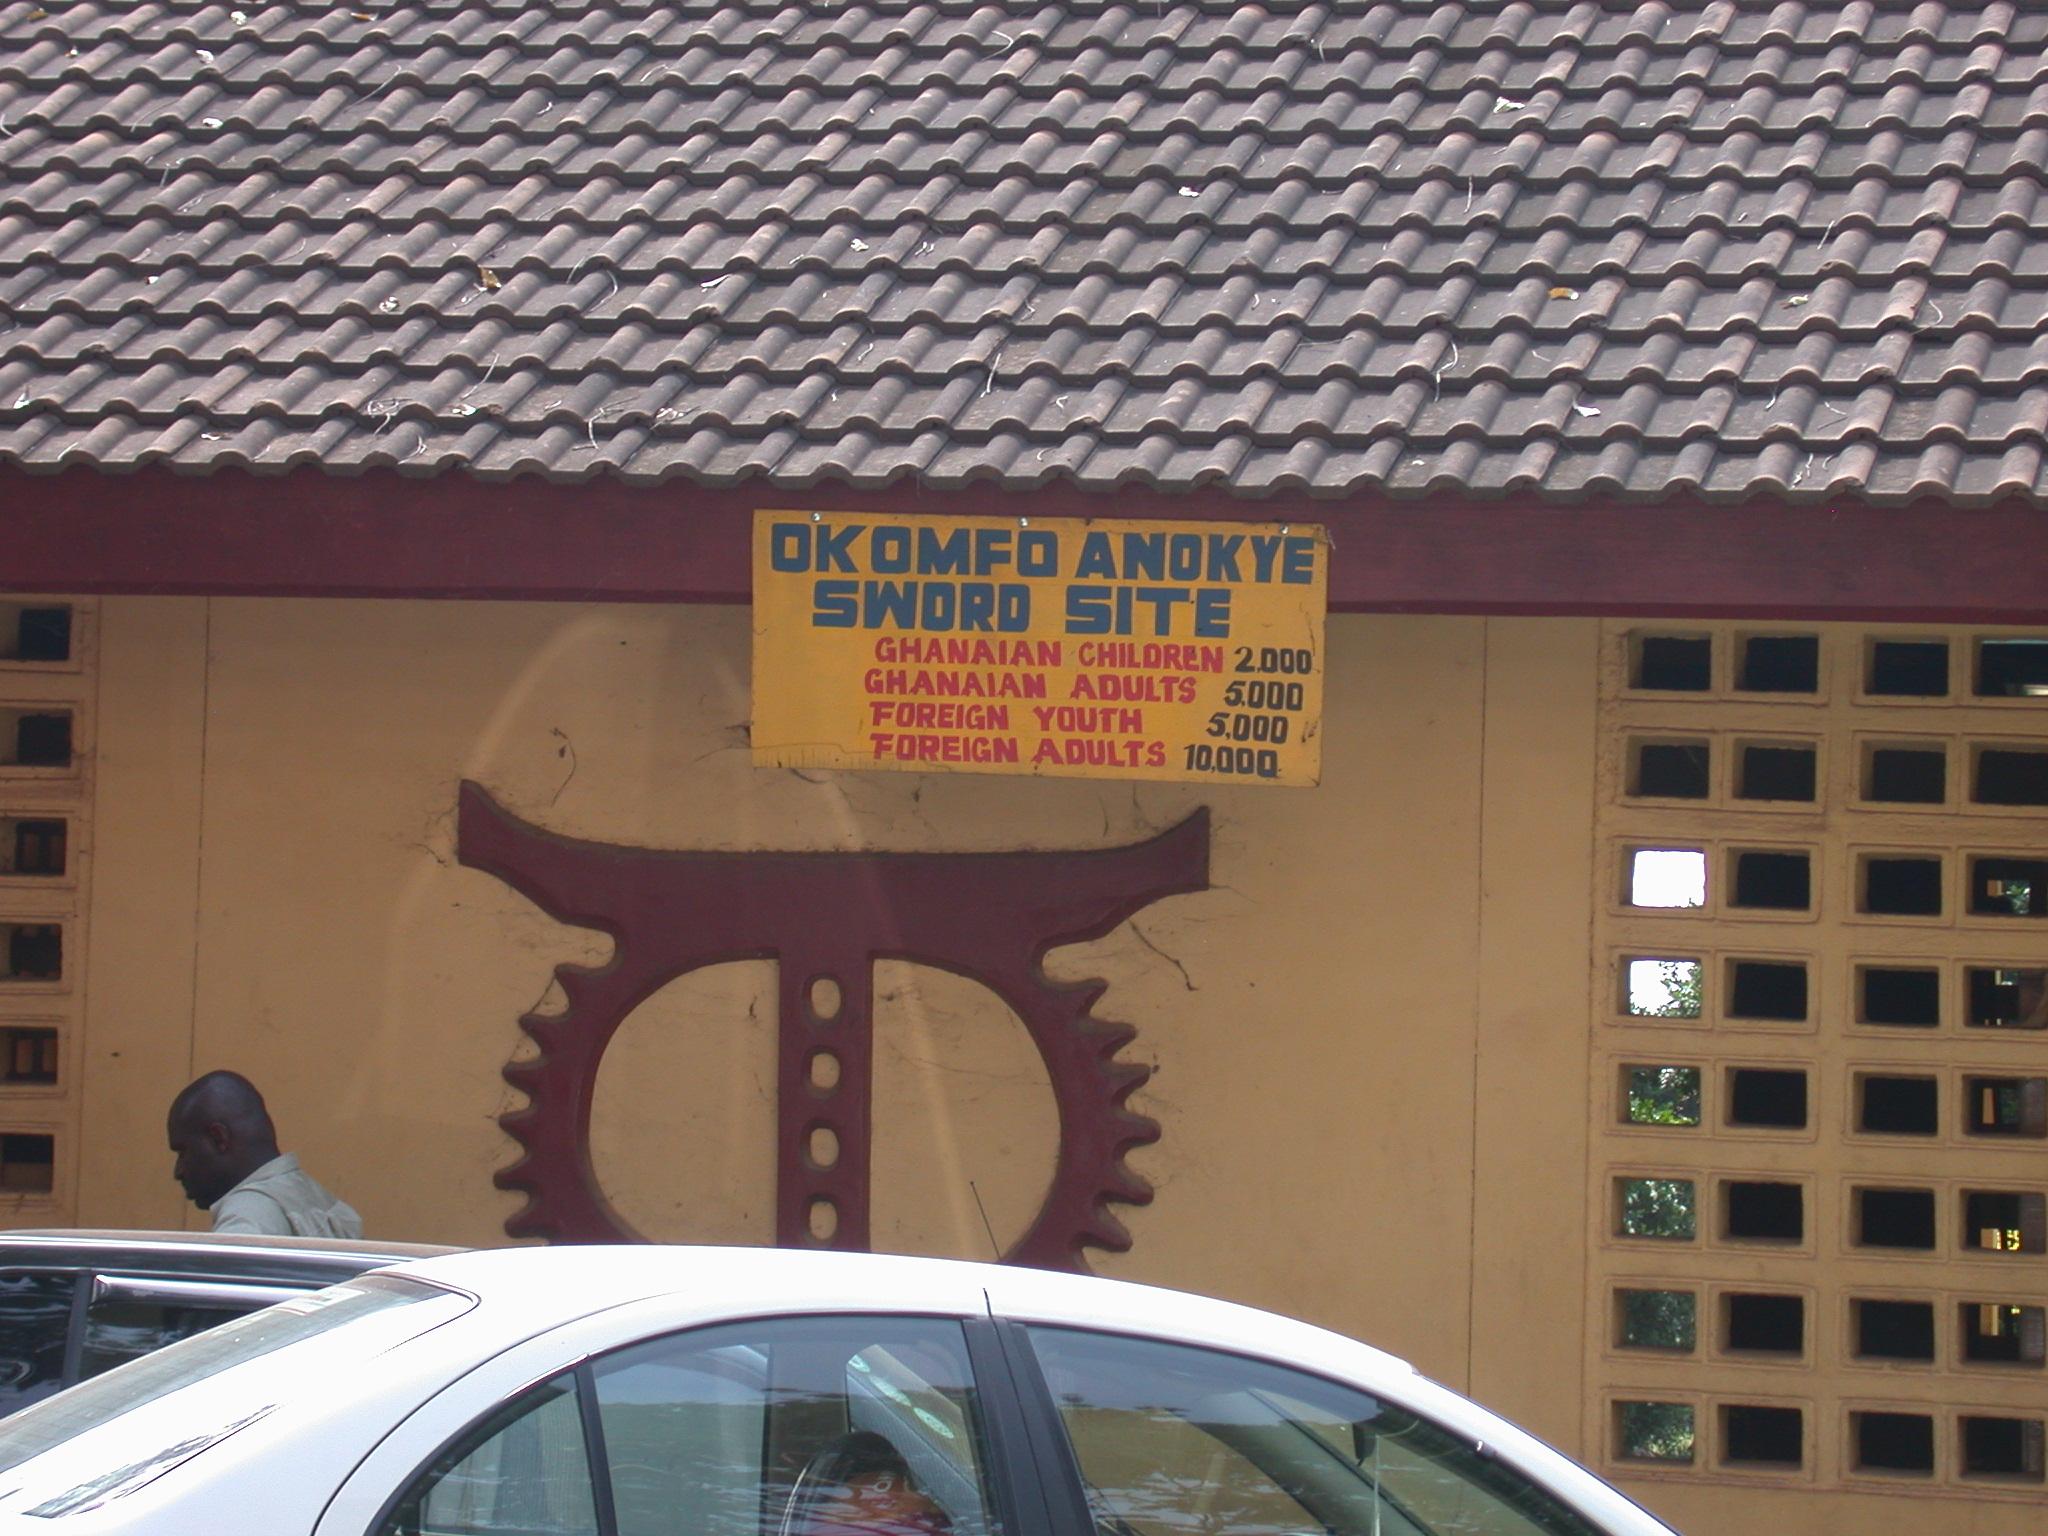 Okomfo Anokye Sword Site, Kumasi, Ghana